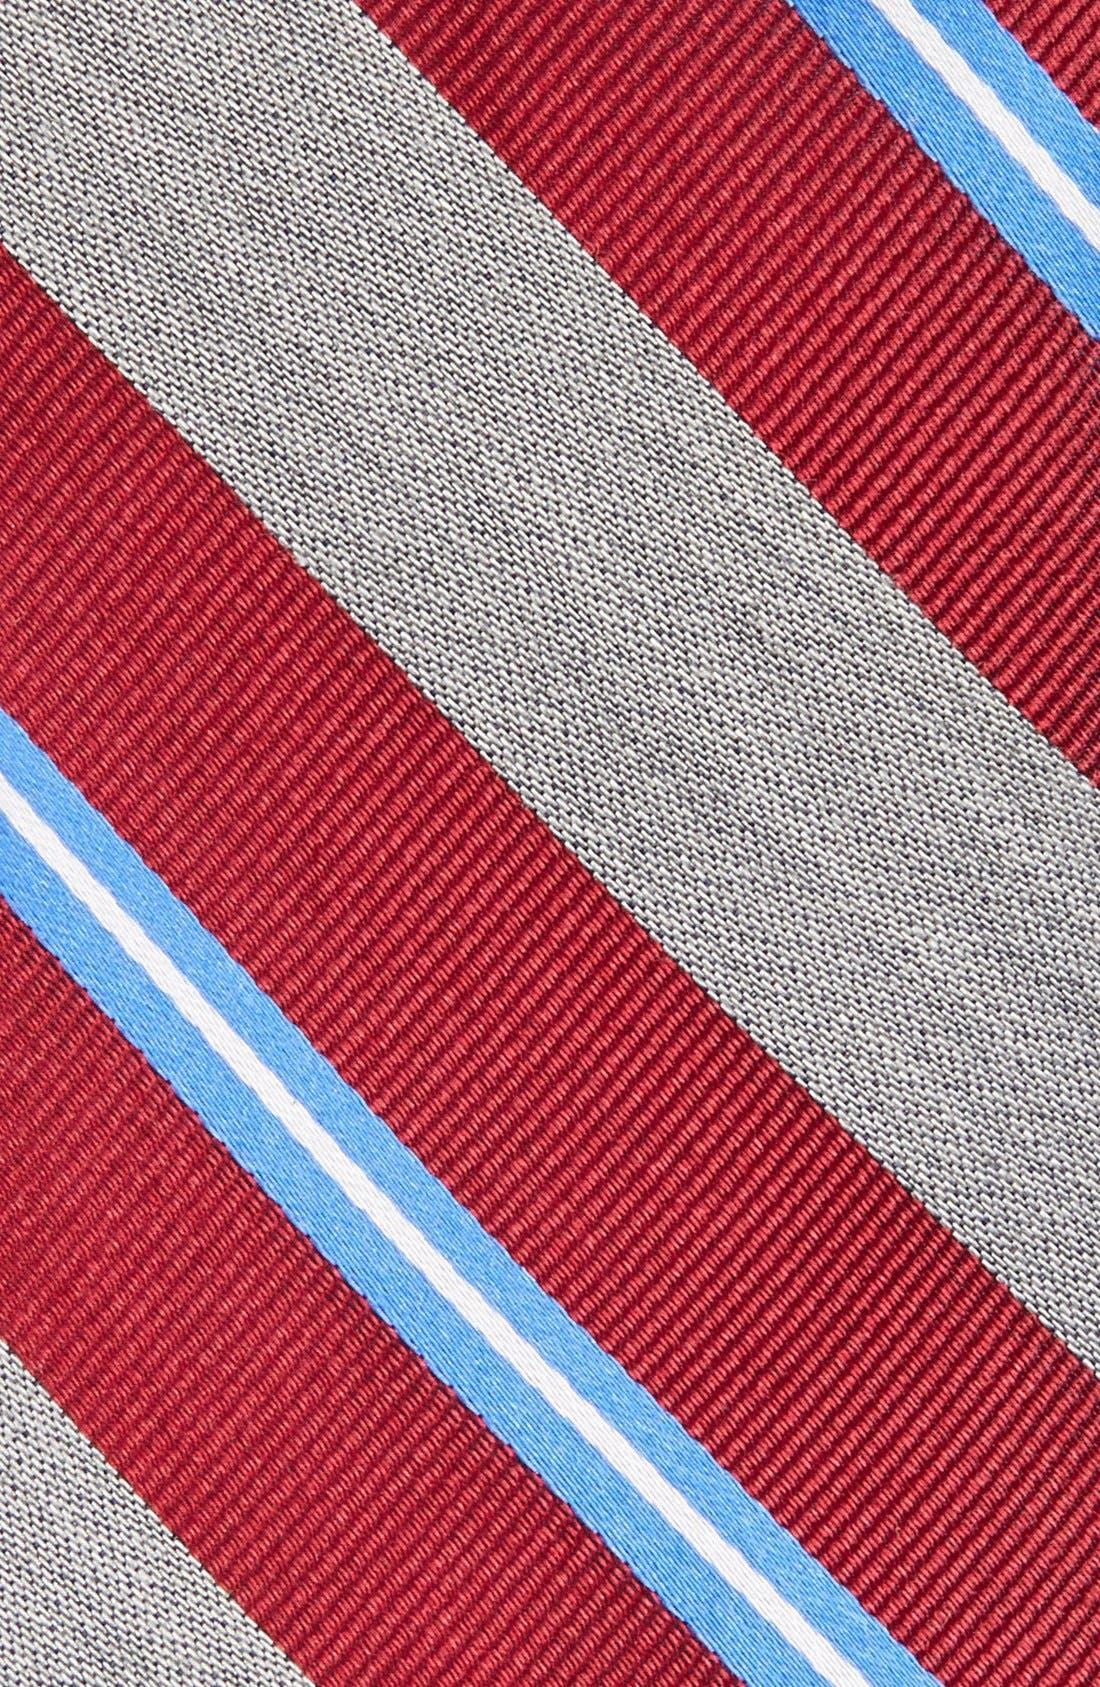 Alternate Image 2  - 1901 'Brady' Woven Silk Blend Tie